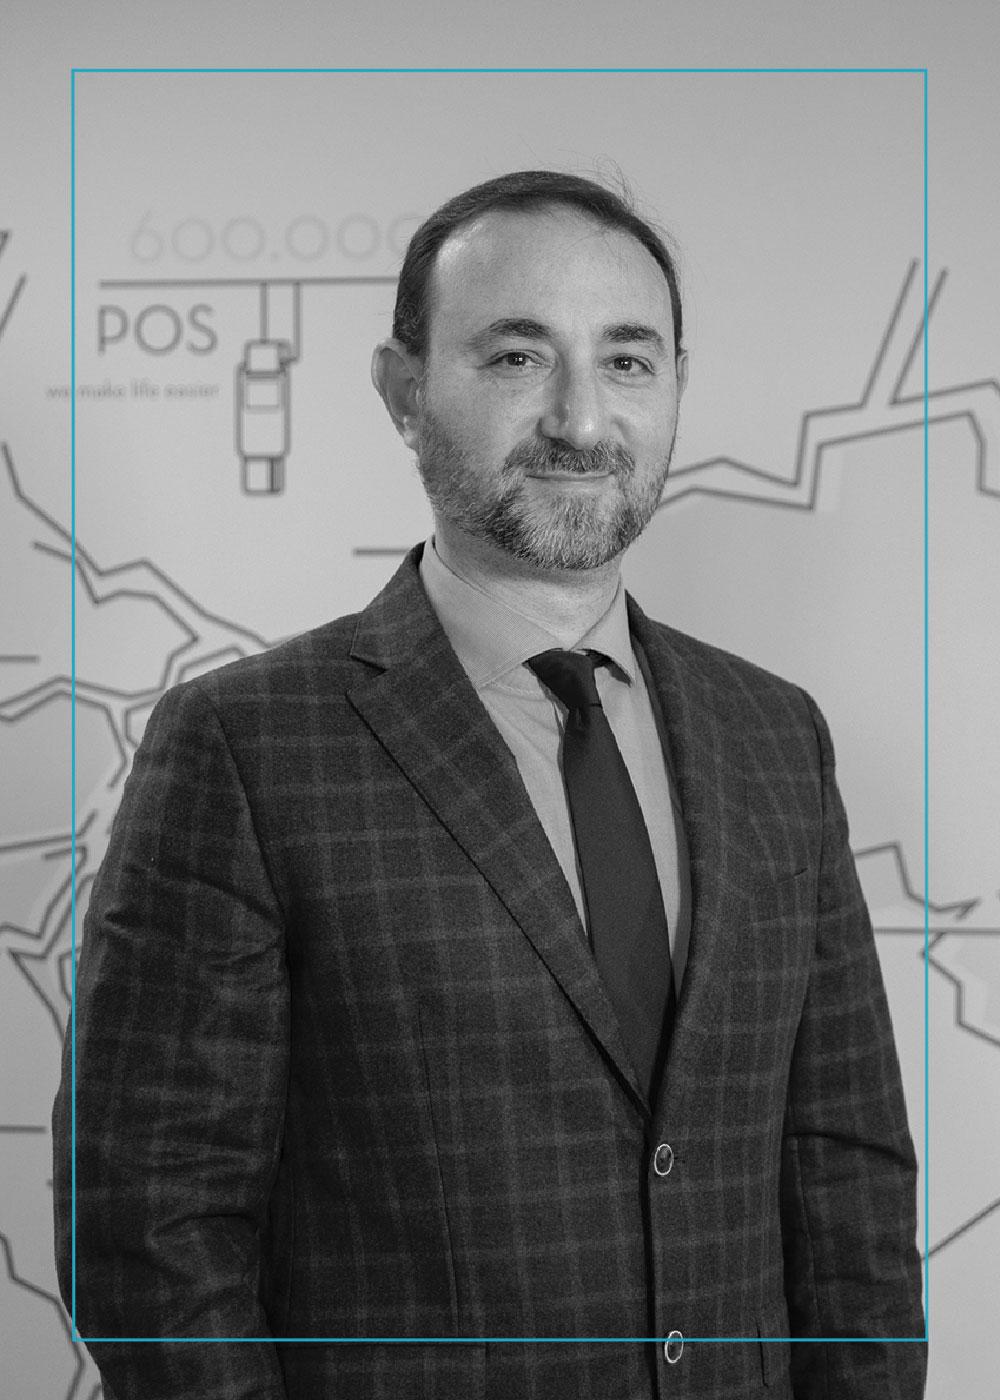 Yiannis Koutrakis